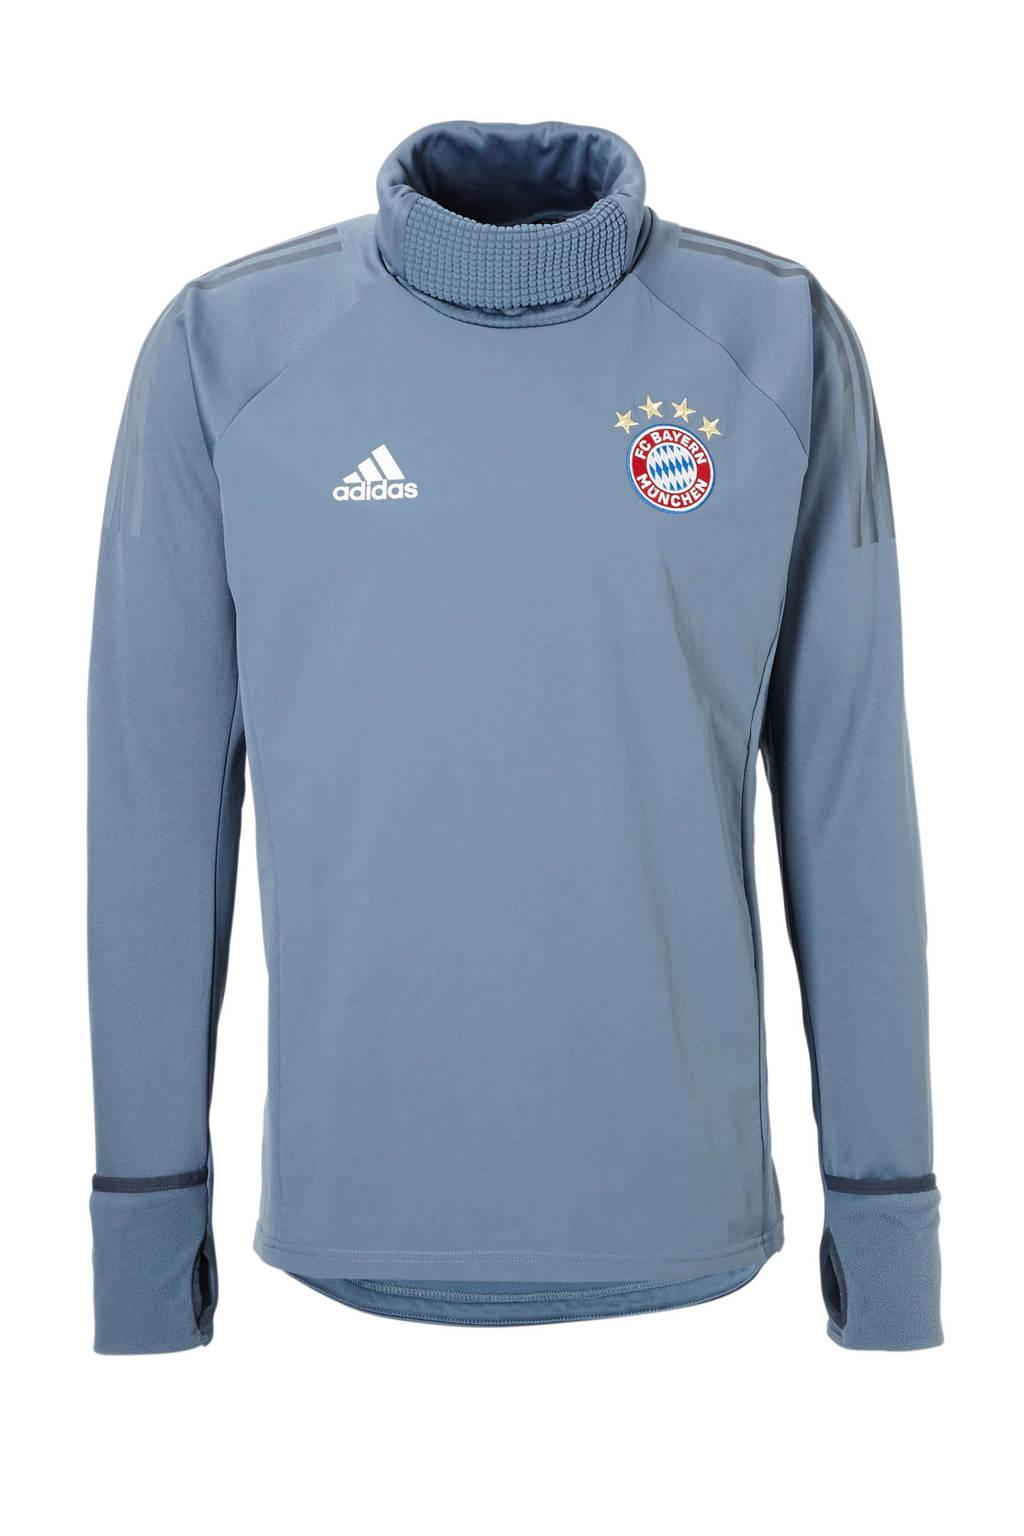 adidas performance Senior FC Bayern München voetbalsweater, Grijs